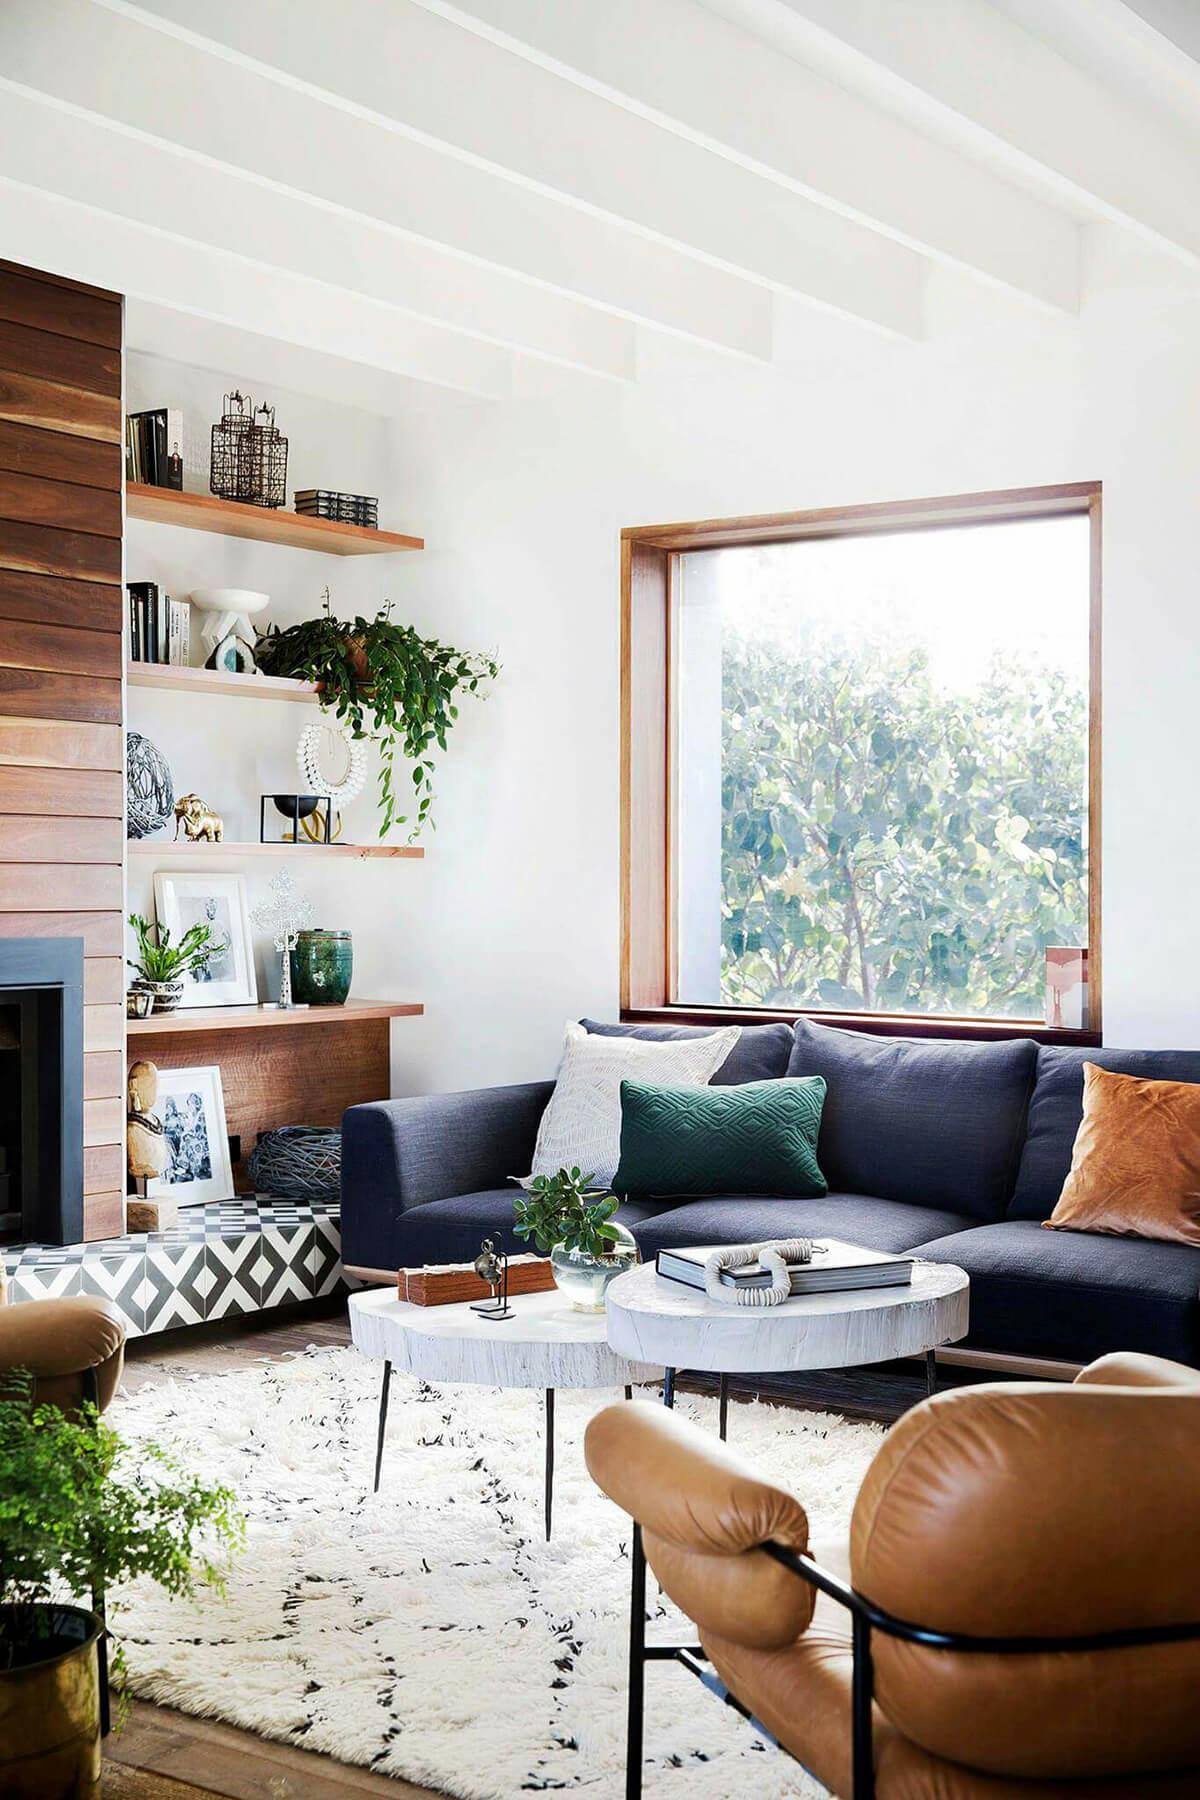 Fullsize Of Interiors Living Room Ideas